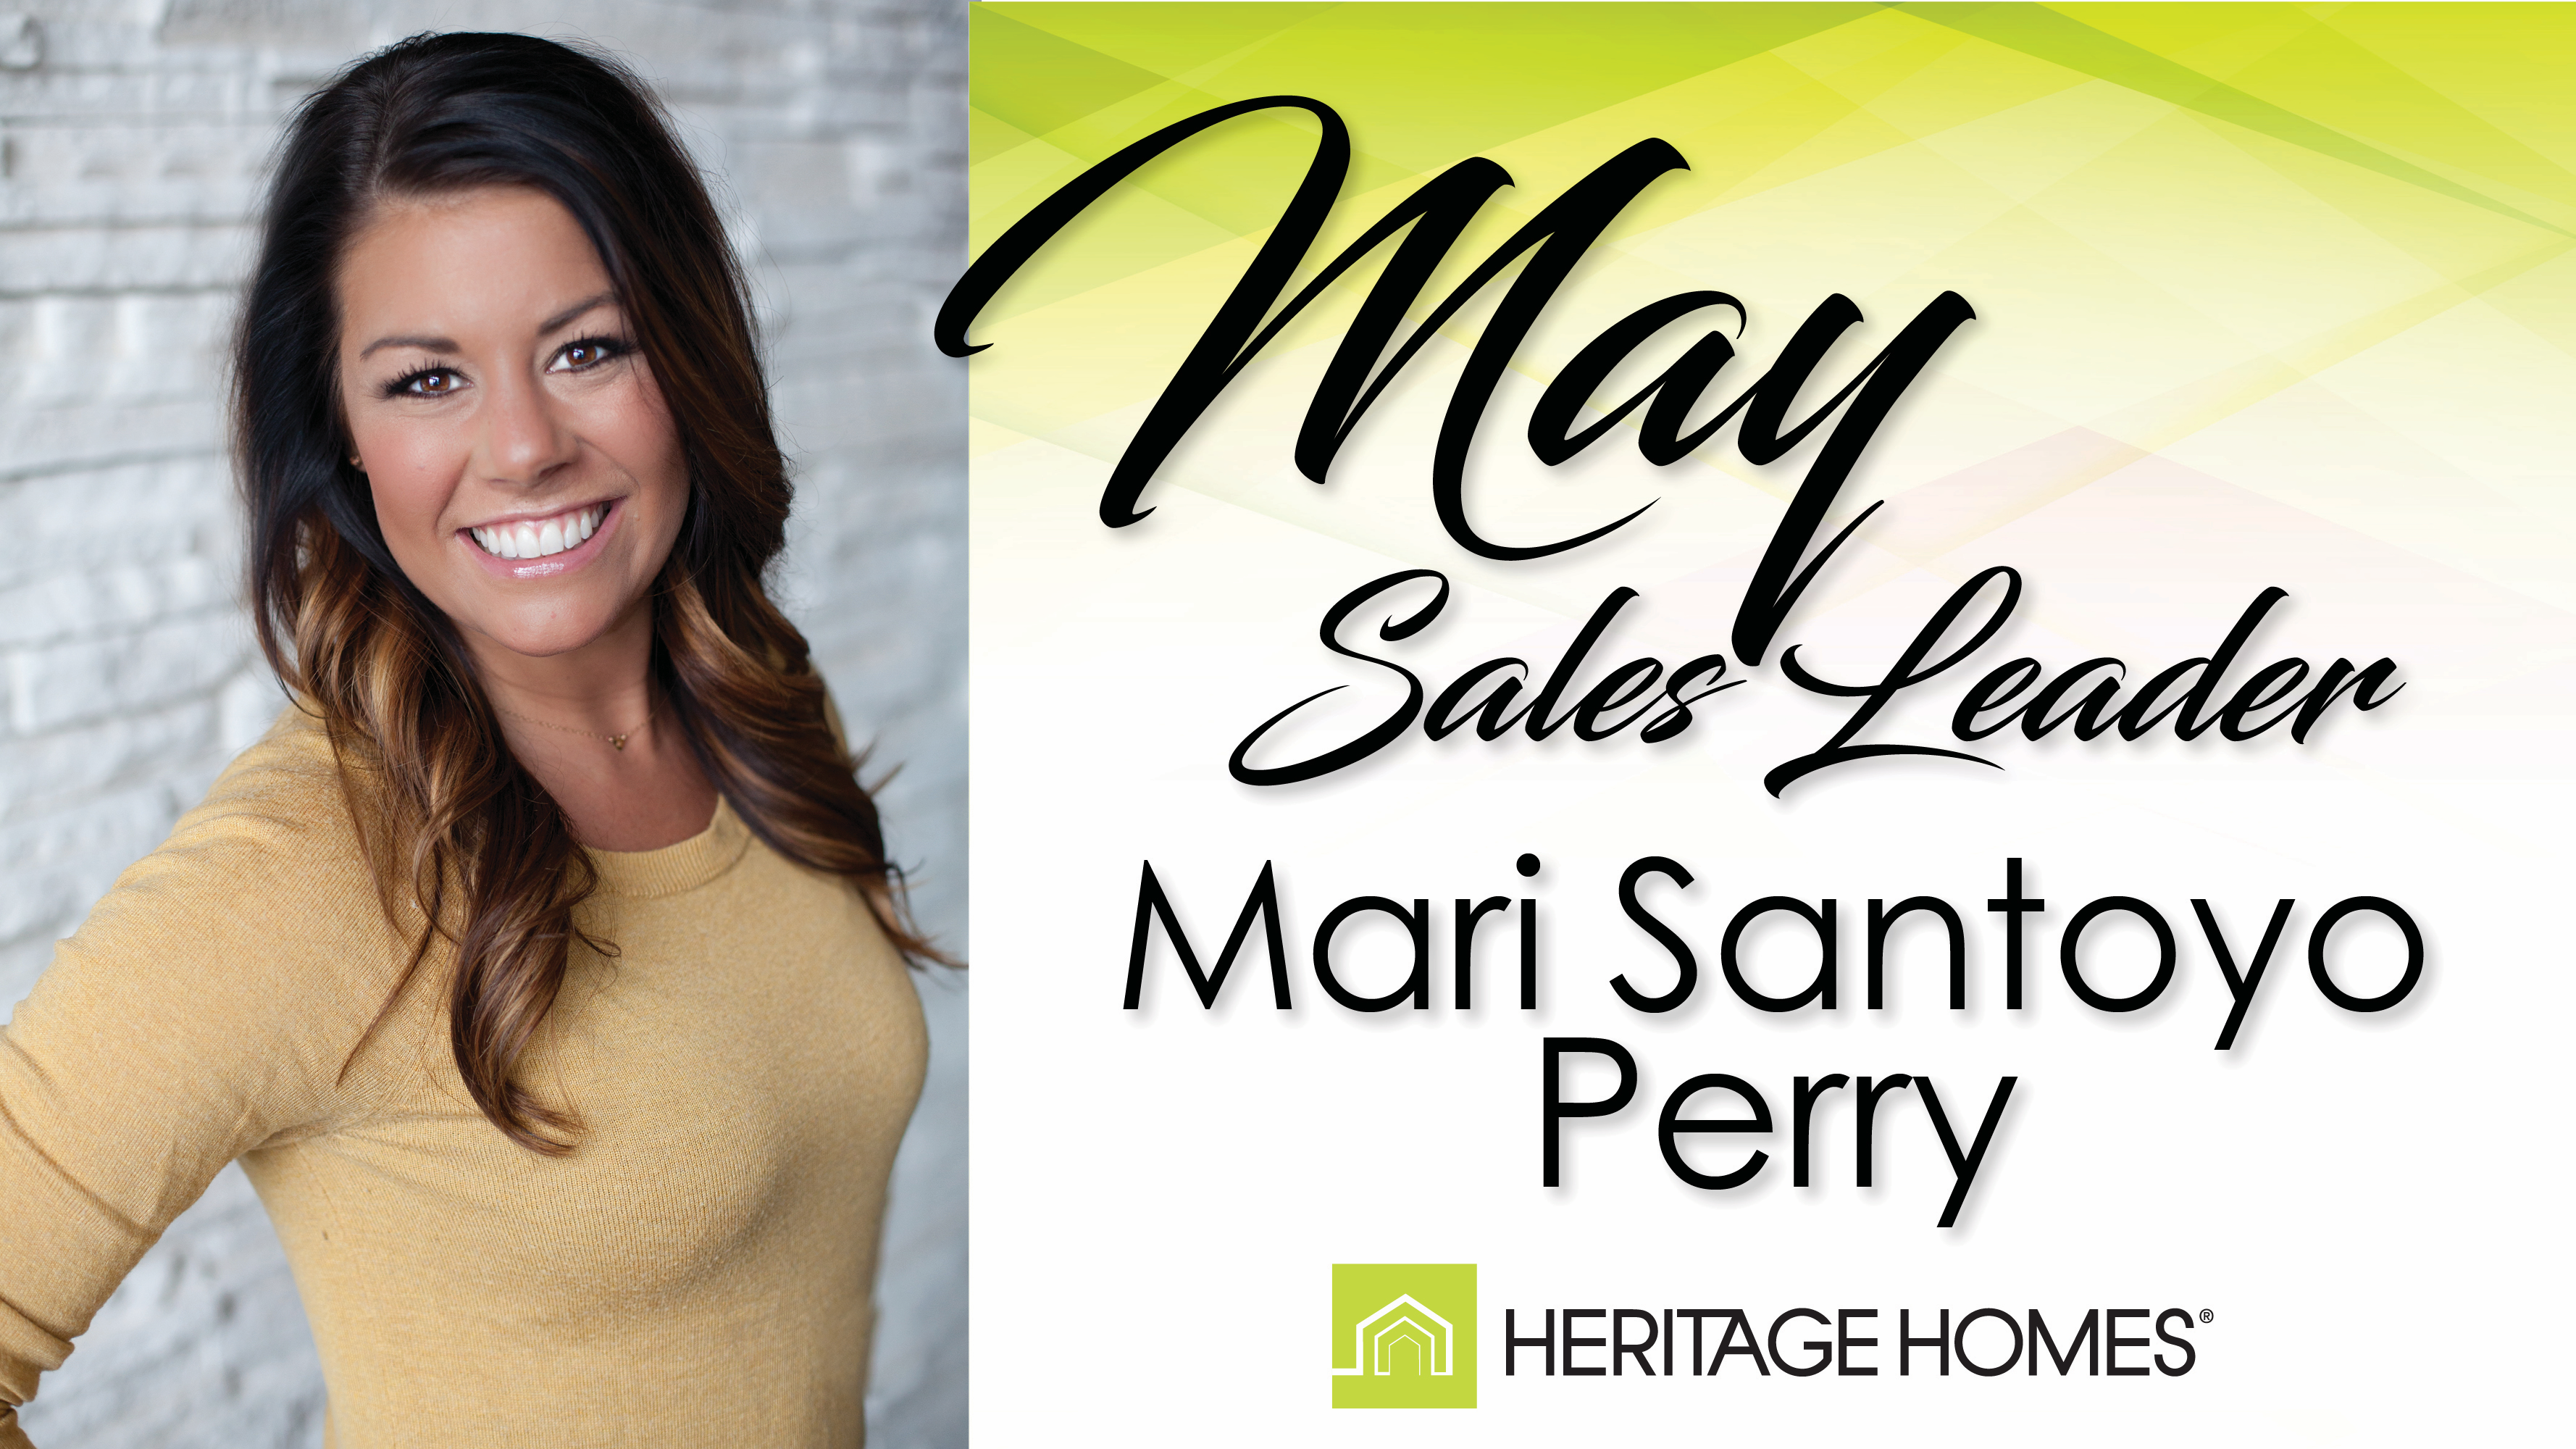 May 2017 Sales Leader – Mari Santoyo Perry